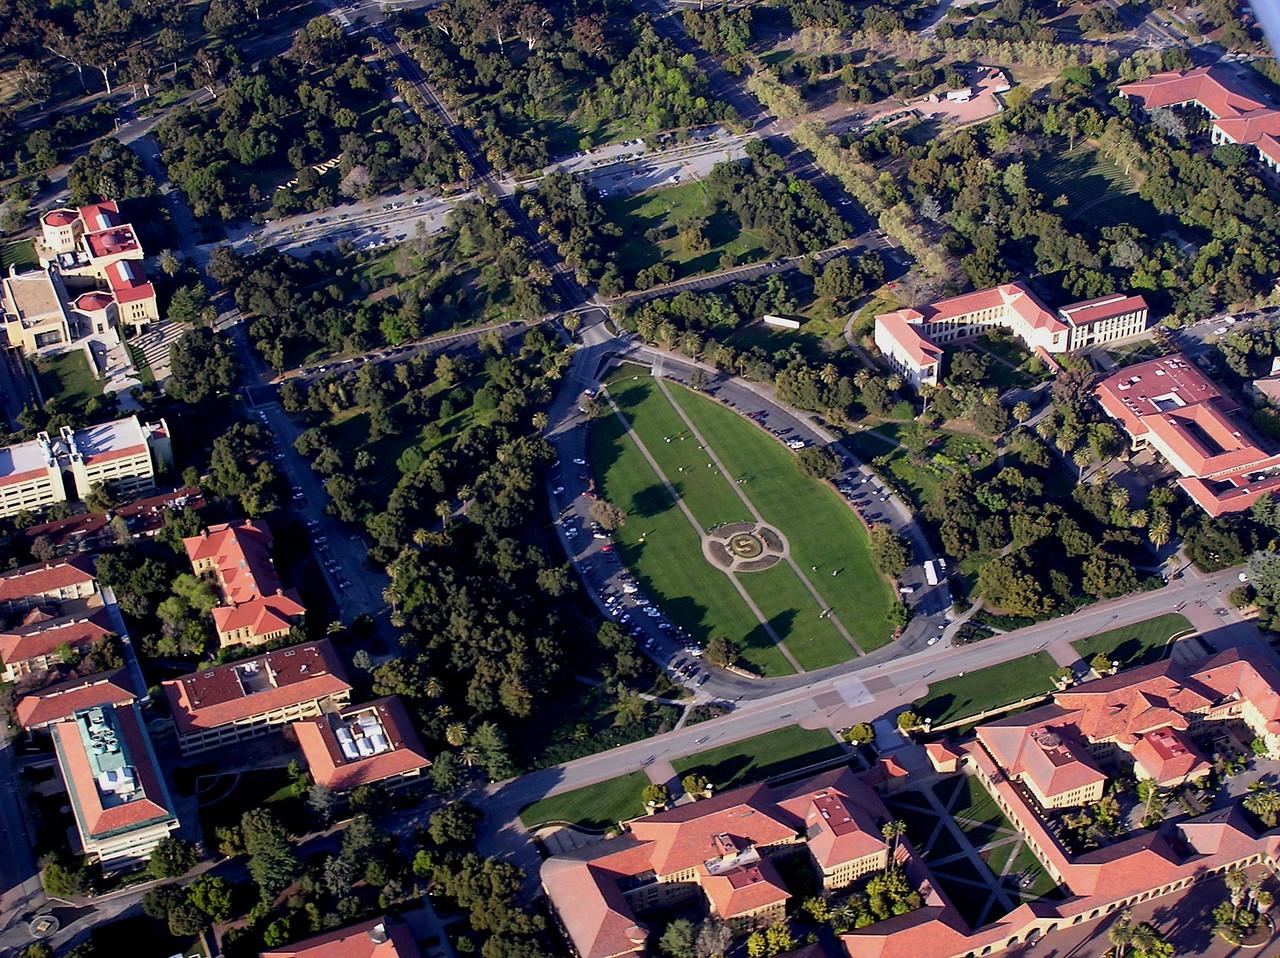 Stanford University, Palo Alto